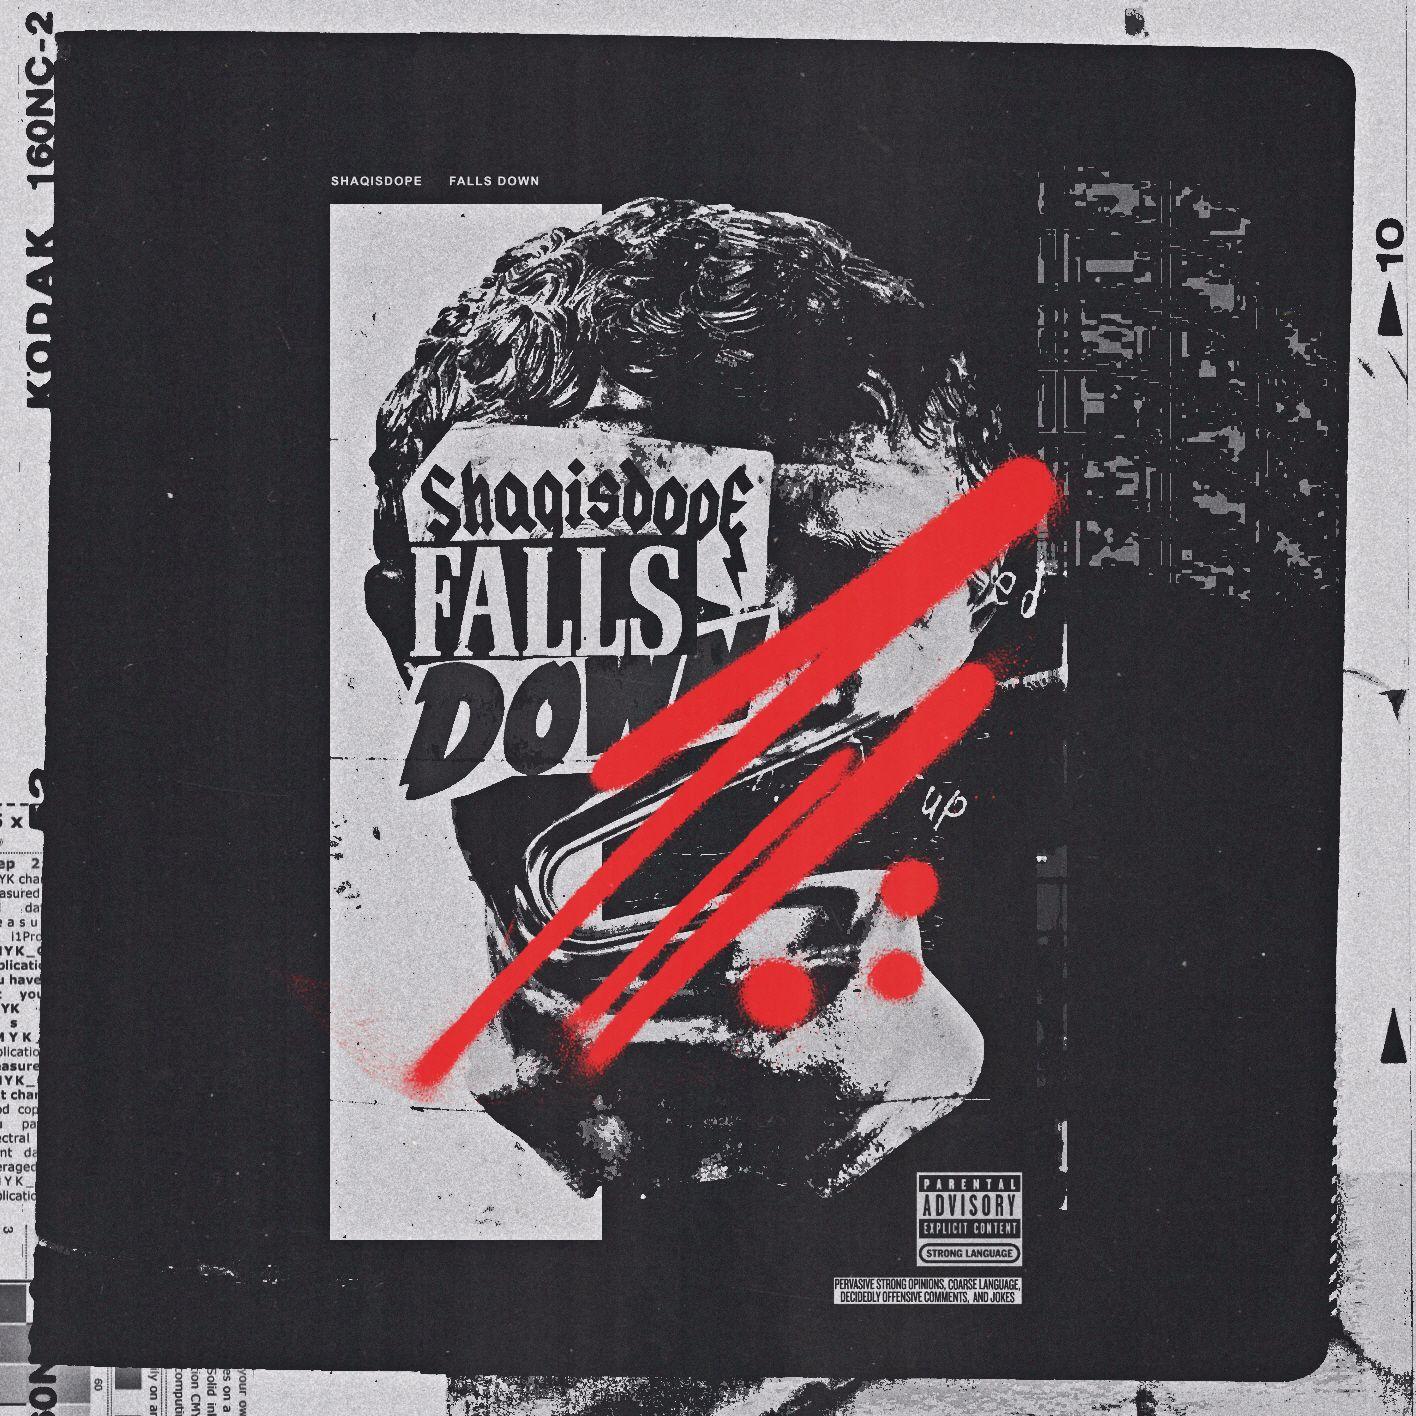 shaqisdope-falls-down